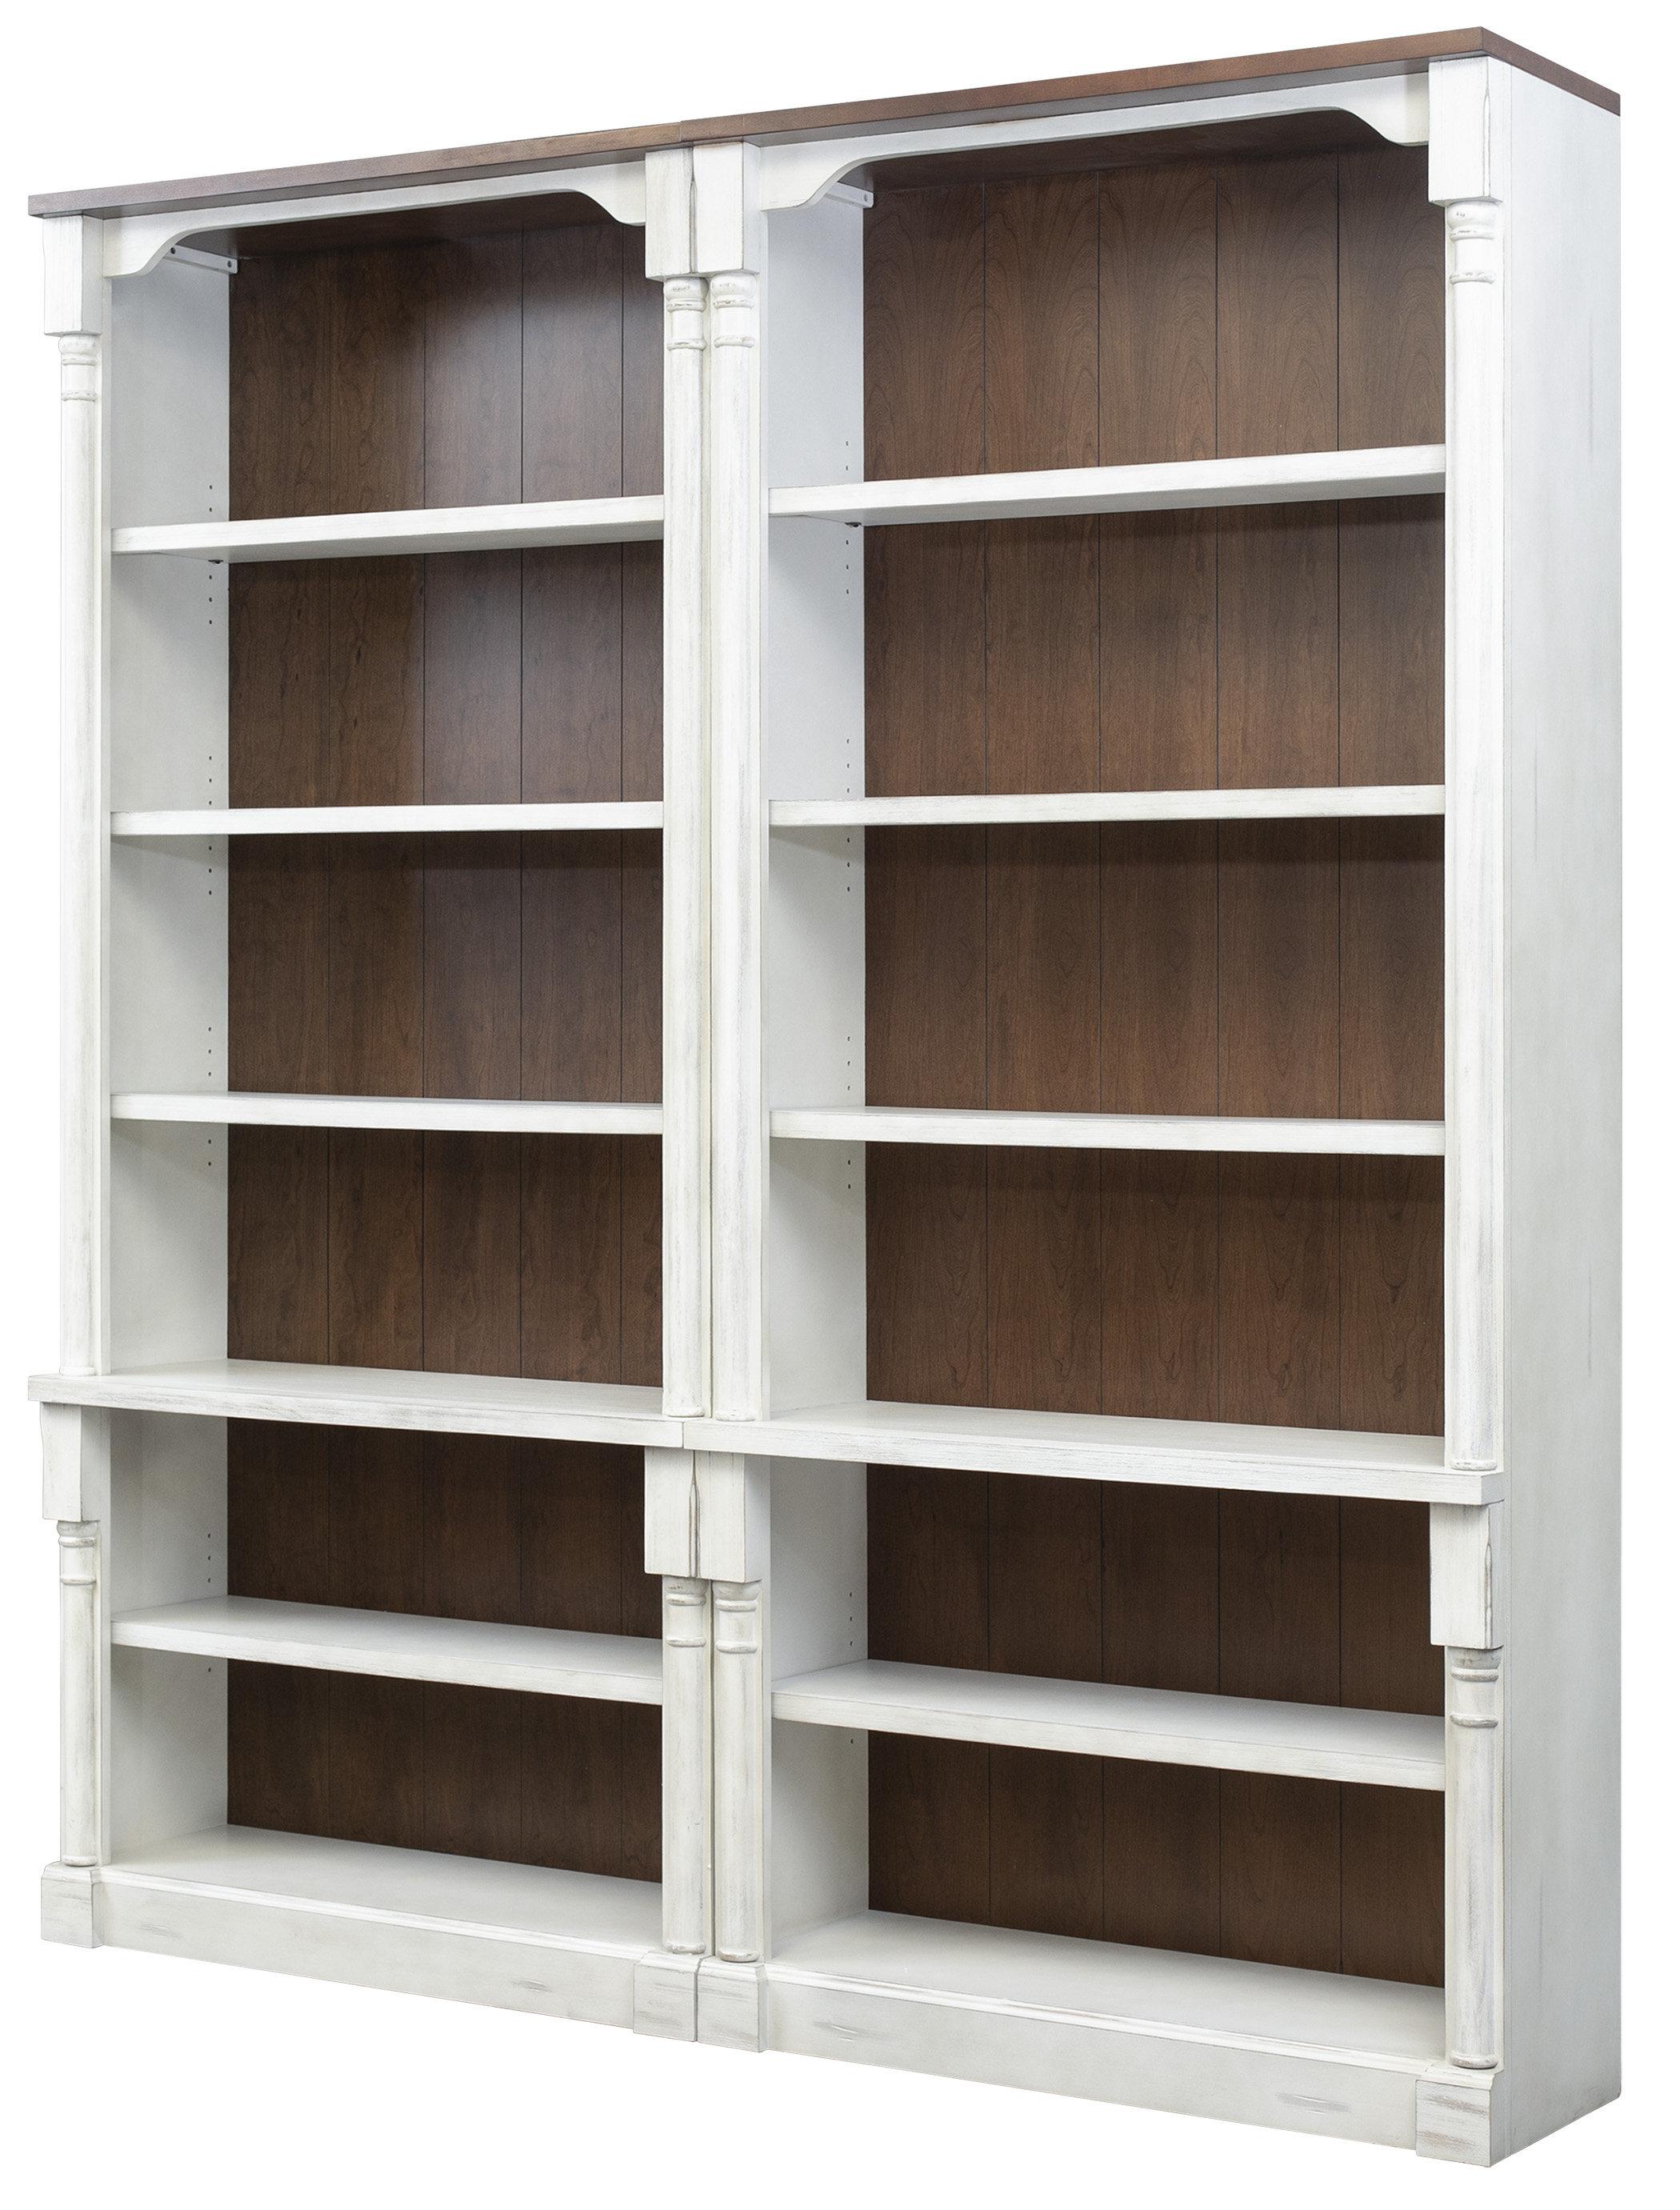 Martin Home Furnishings Durham Standard Bookcase Reviews Wayfair